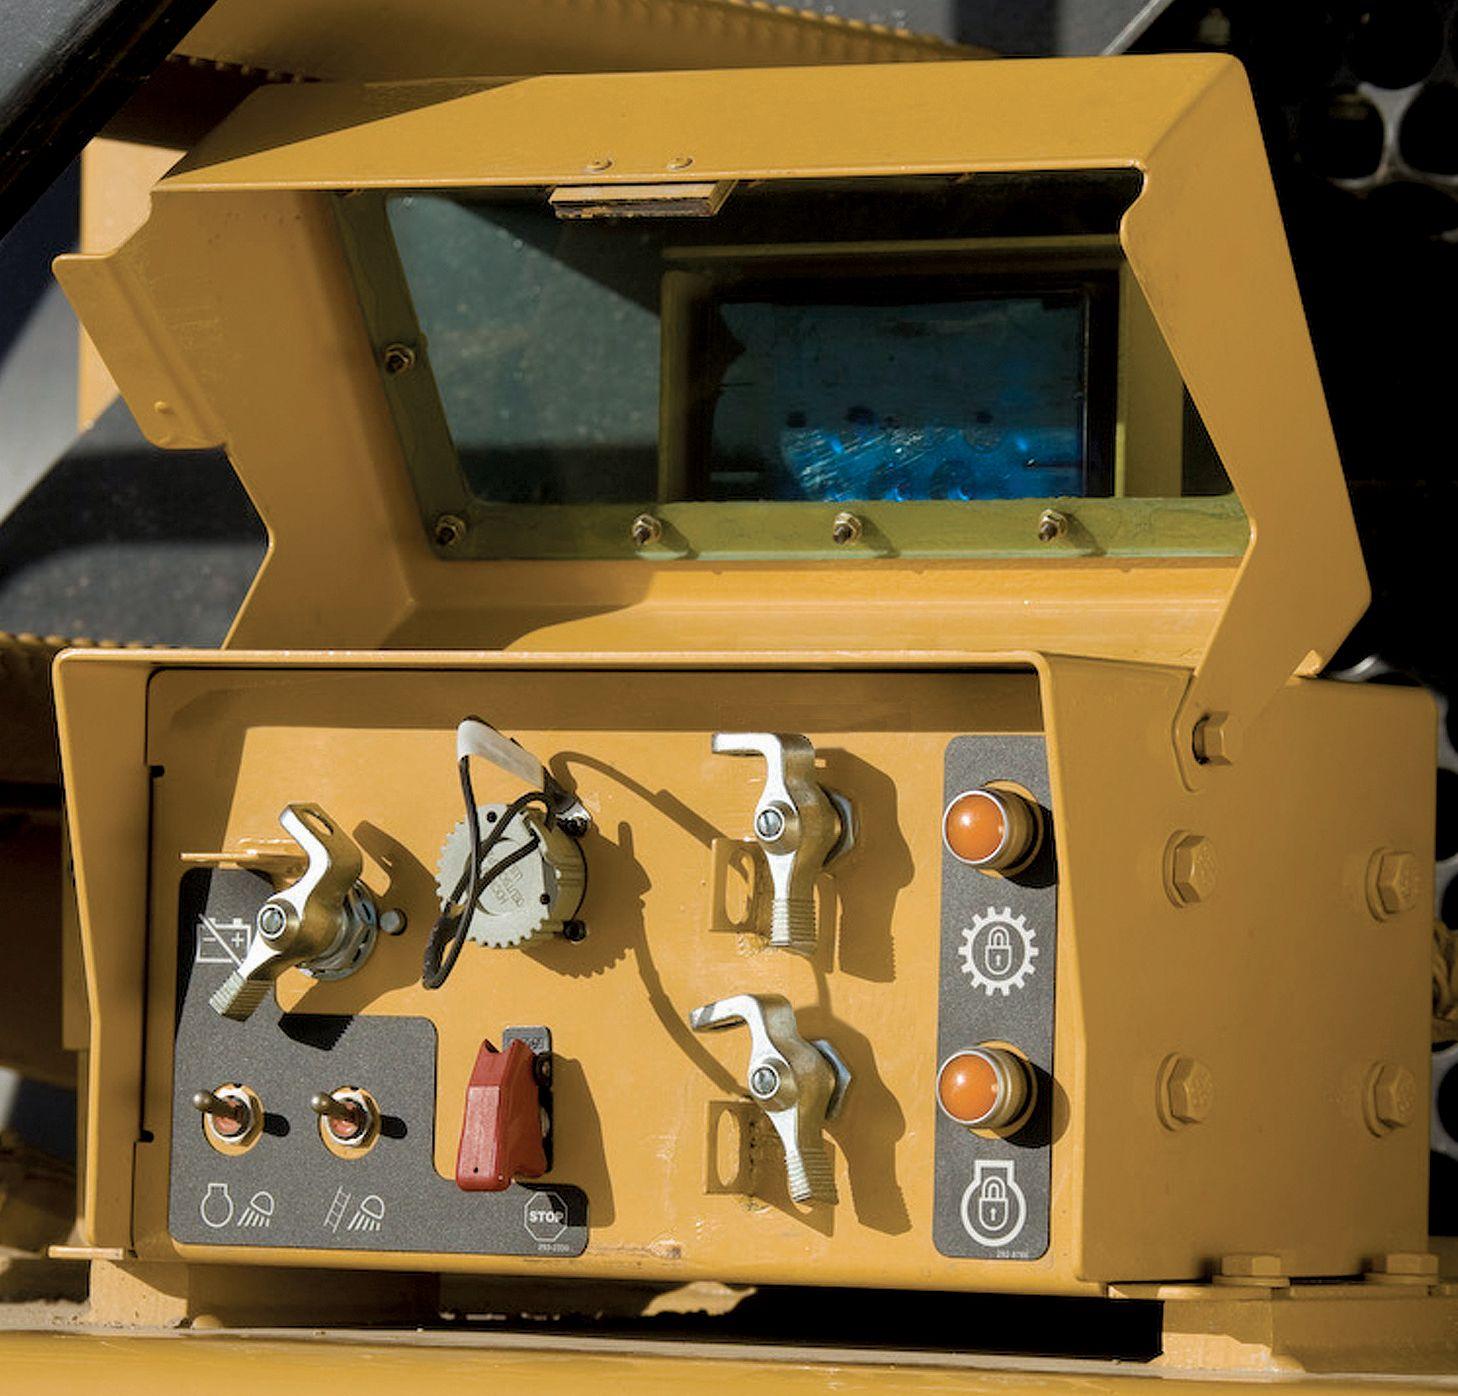 Off Highway Trucks Mining Toromont Cat Tel Tach Wiring Diagram For Msd Safety